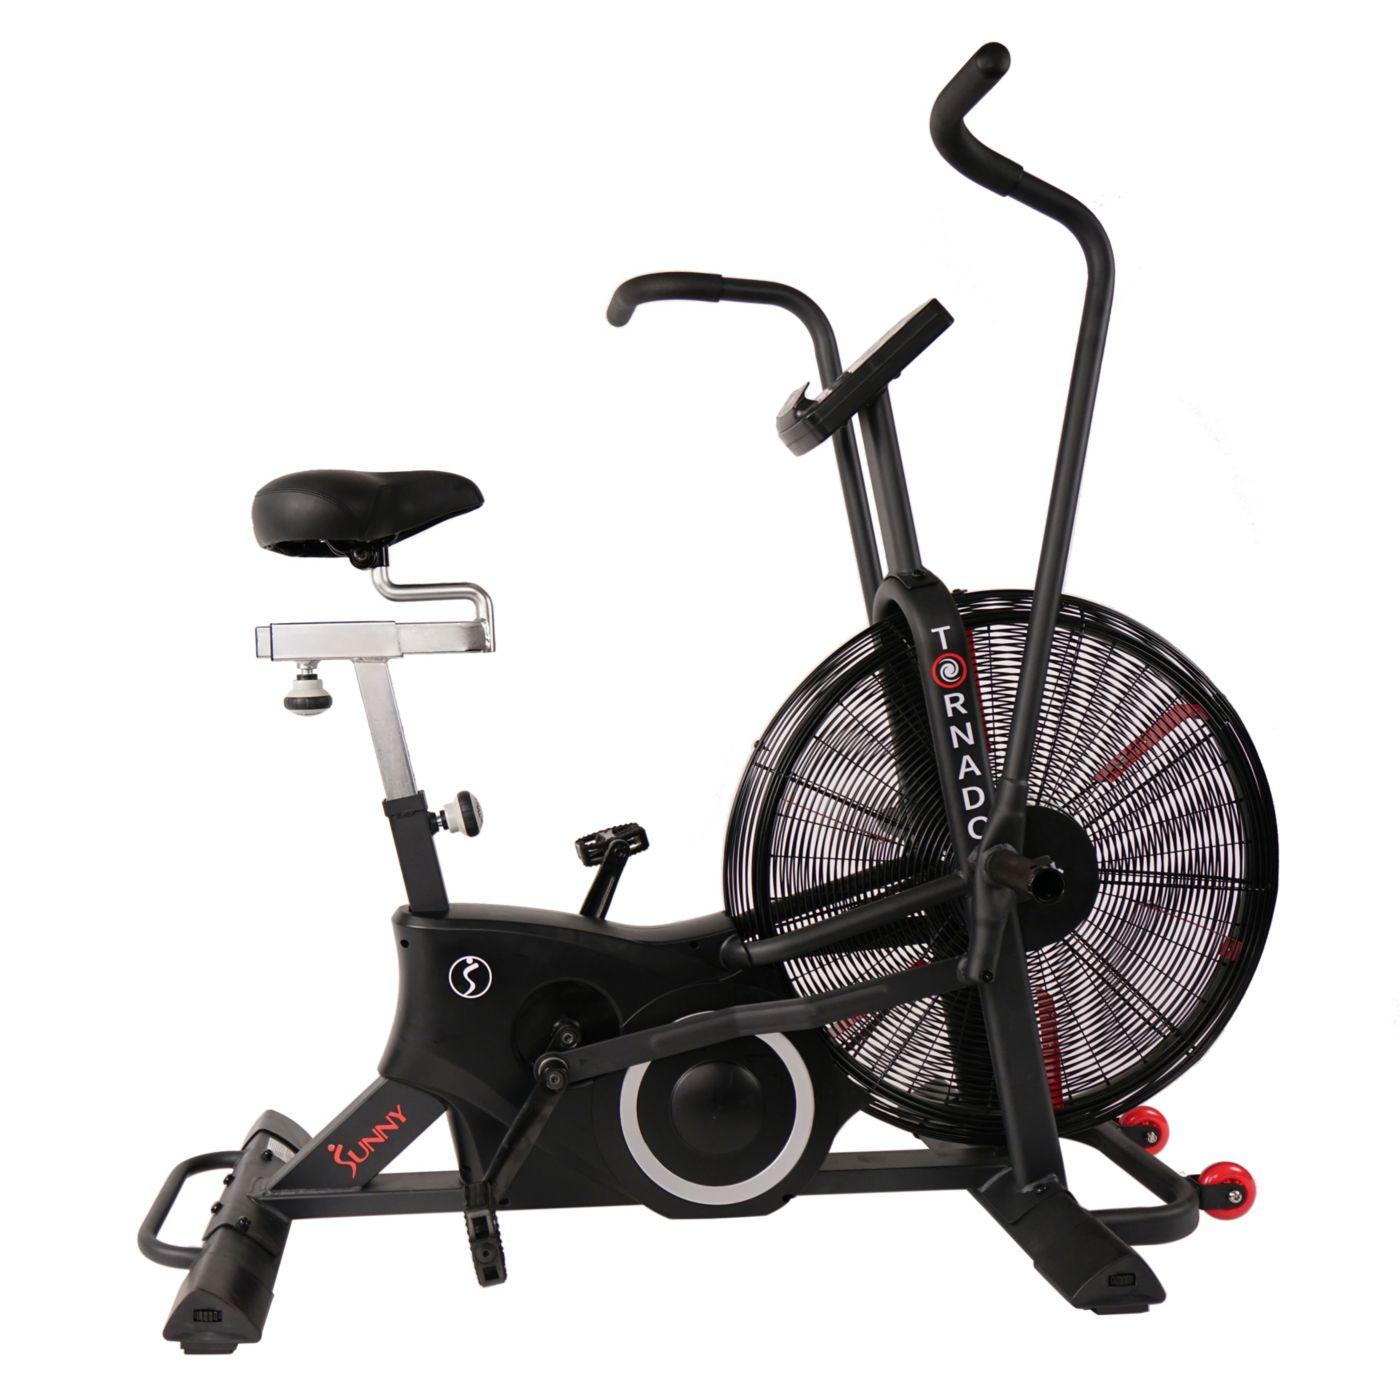 Sunny Health & Fitness Tornado LX Air Bike